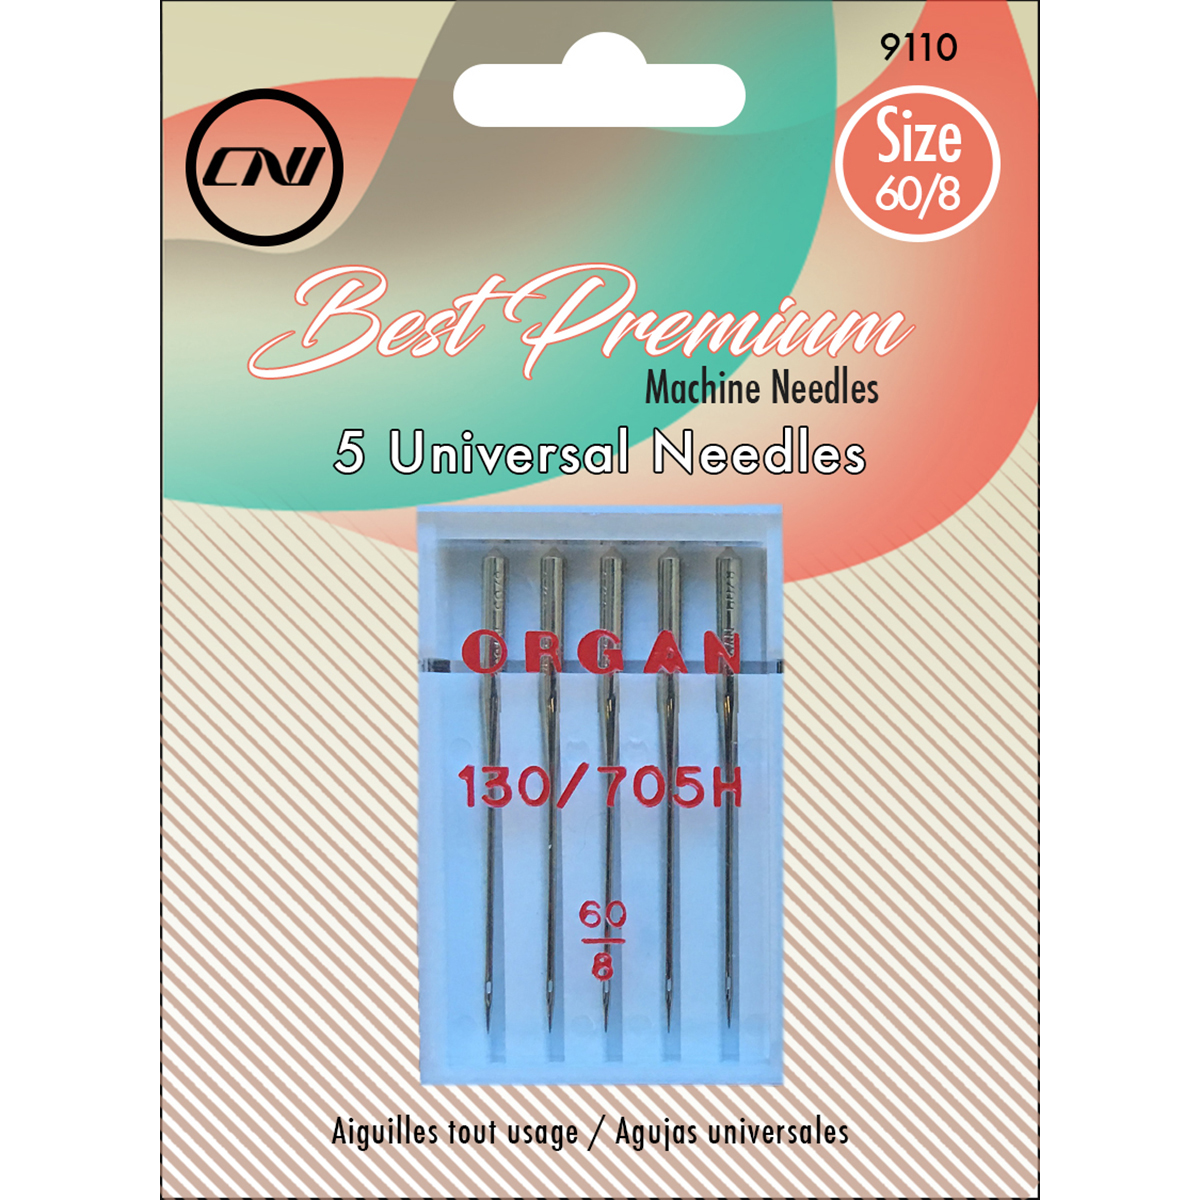 Size 60/8 - Universal Sewing Machine Needles 5/Pkg